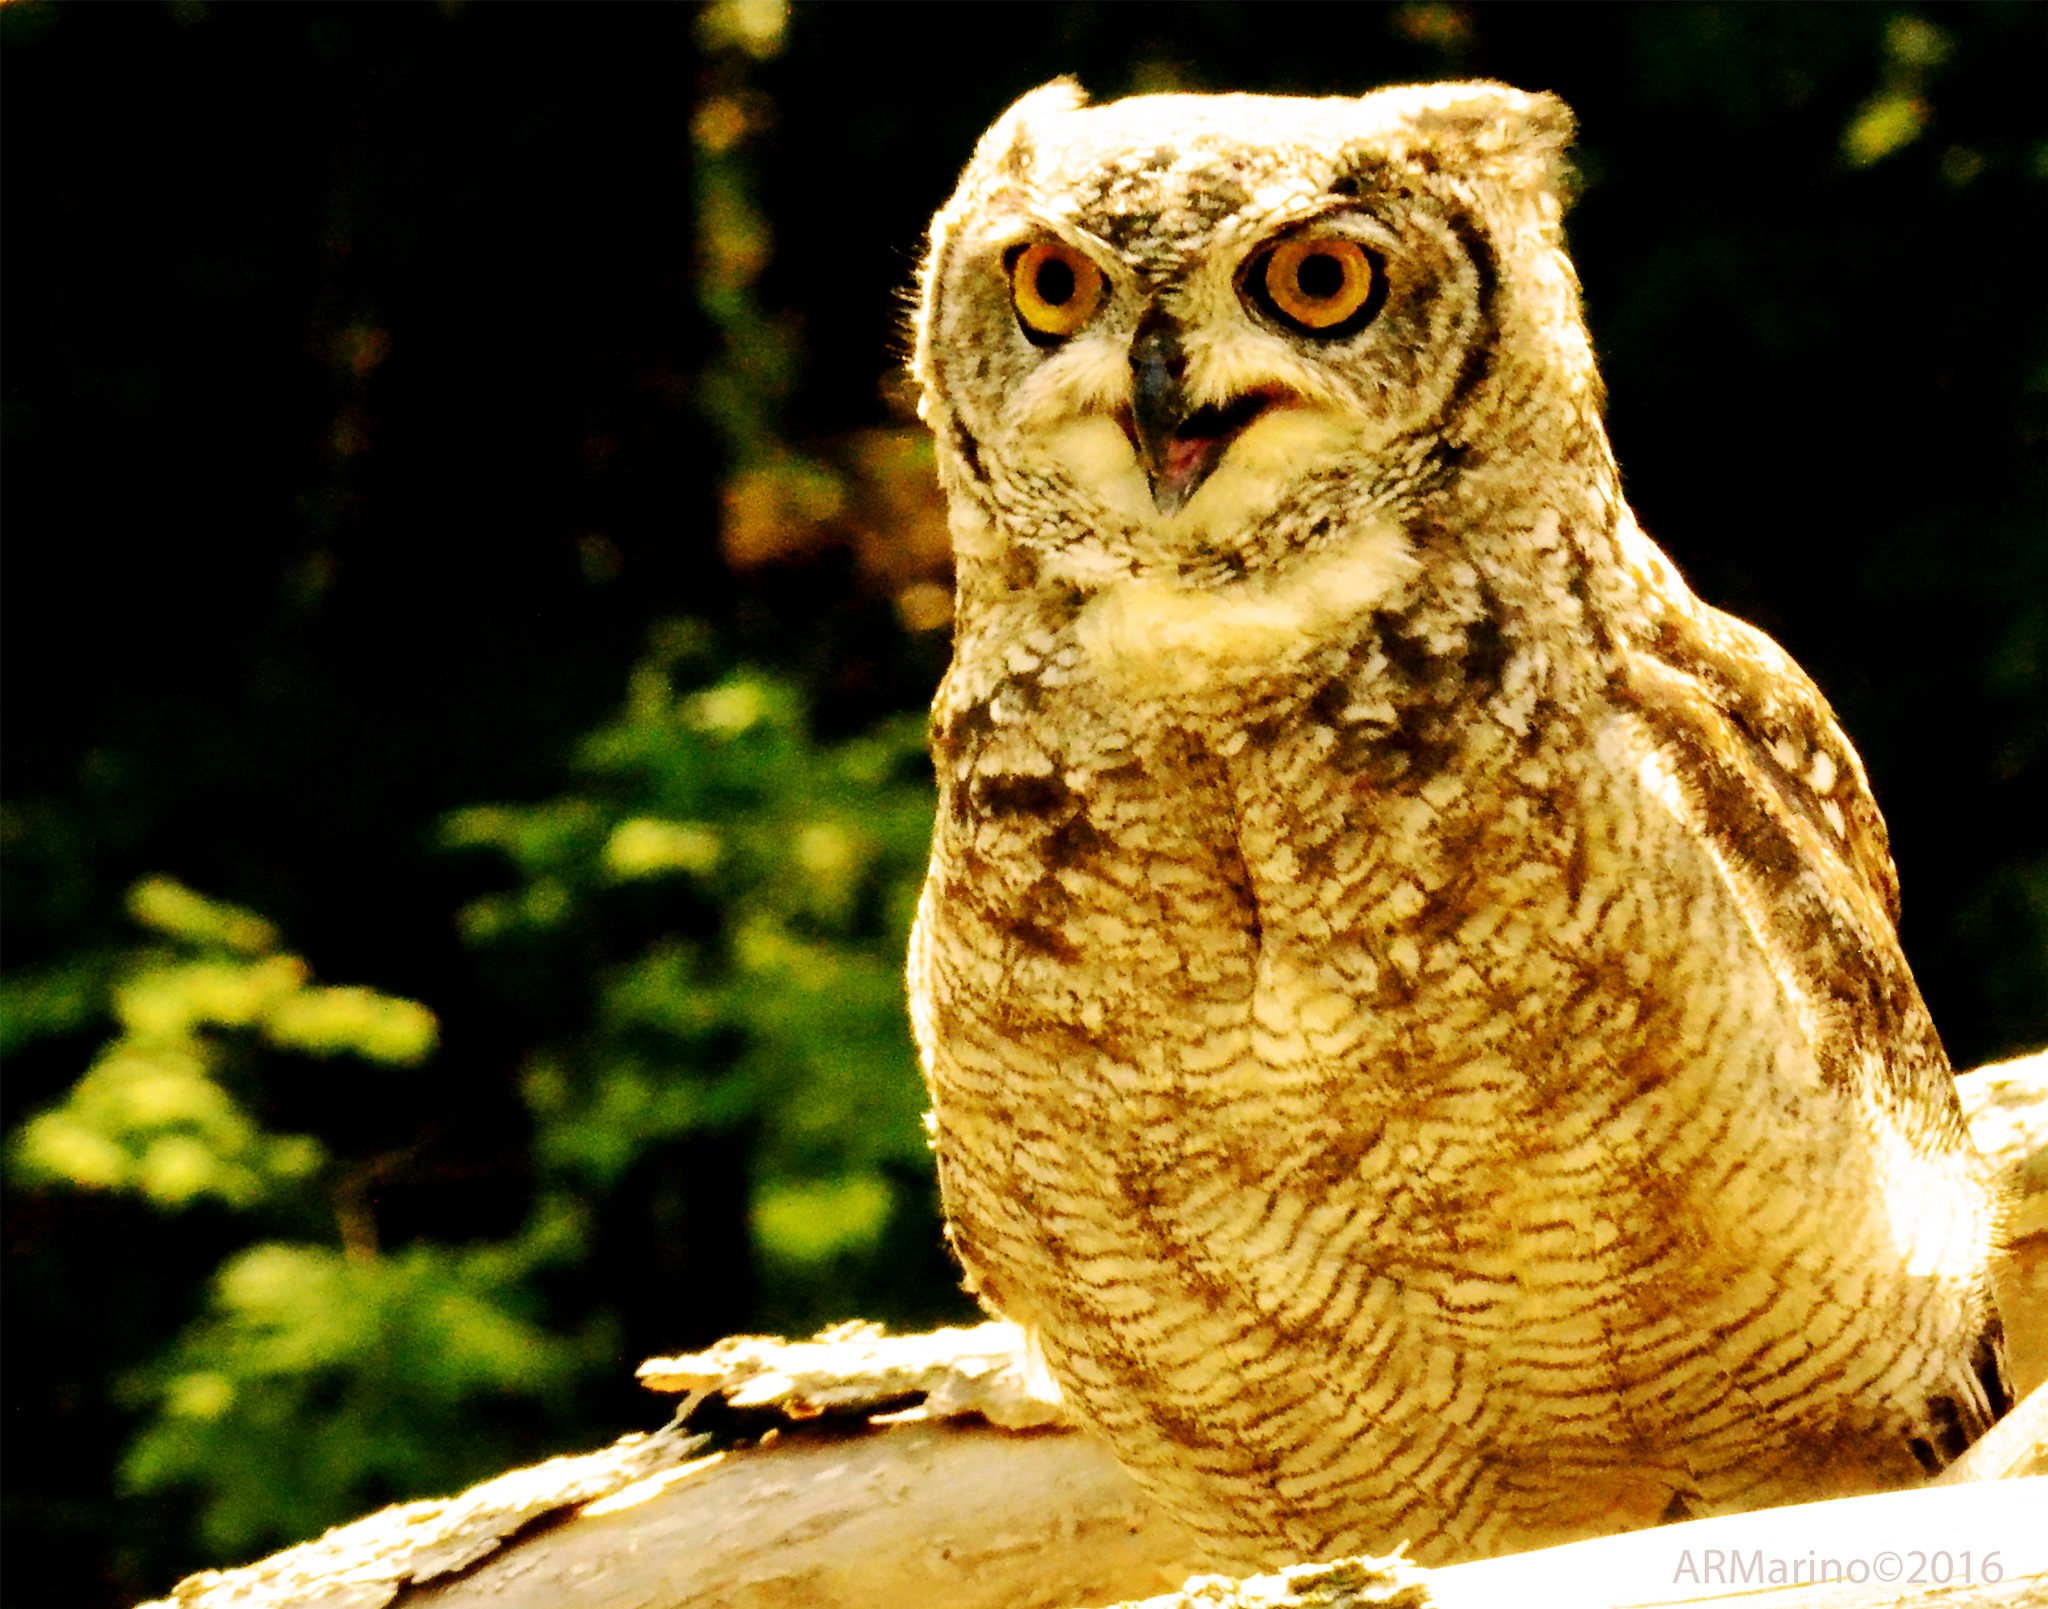 Owl202 by A R Marino